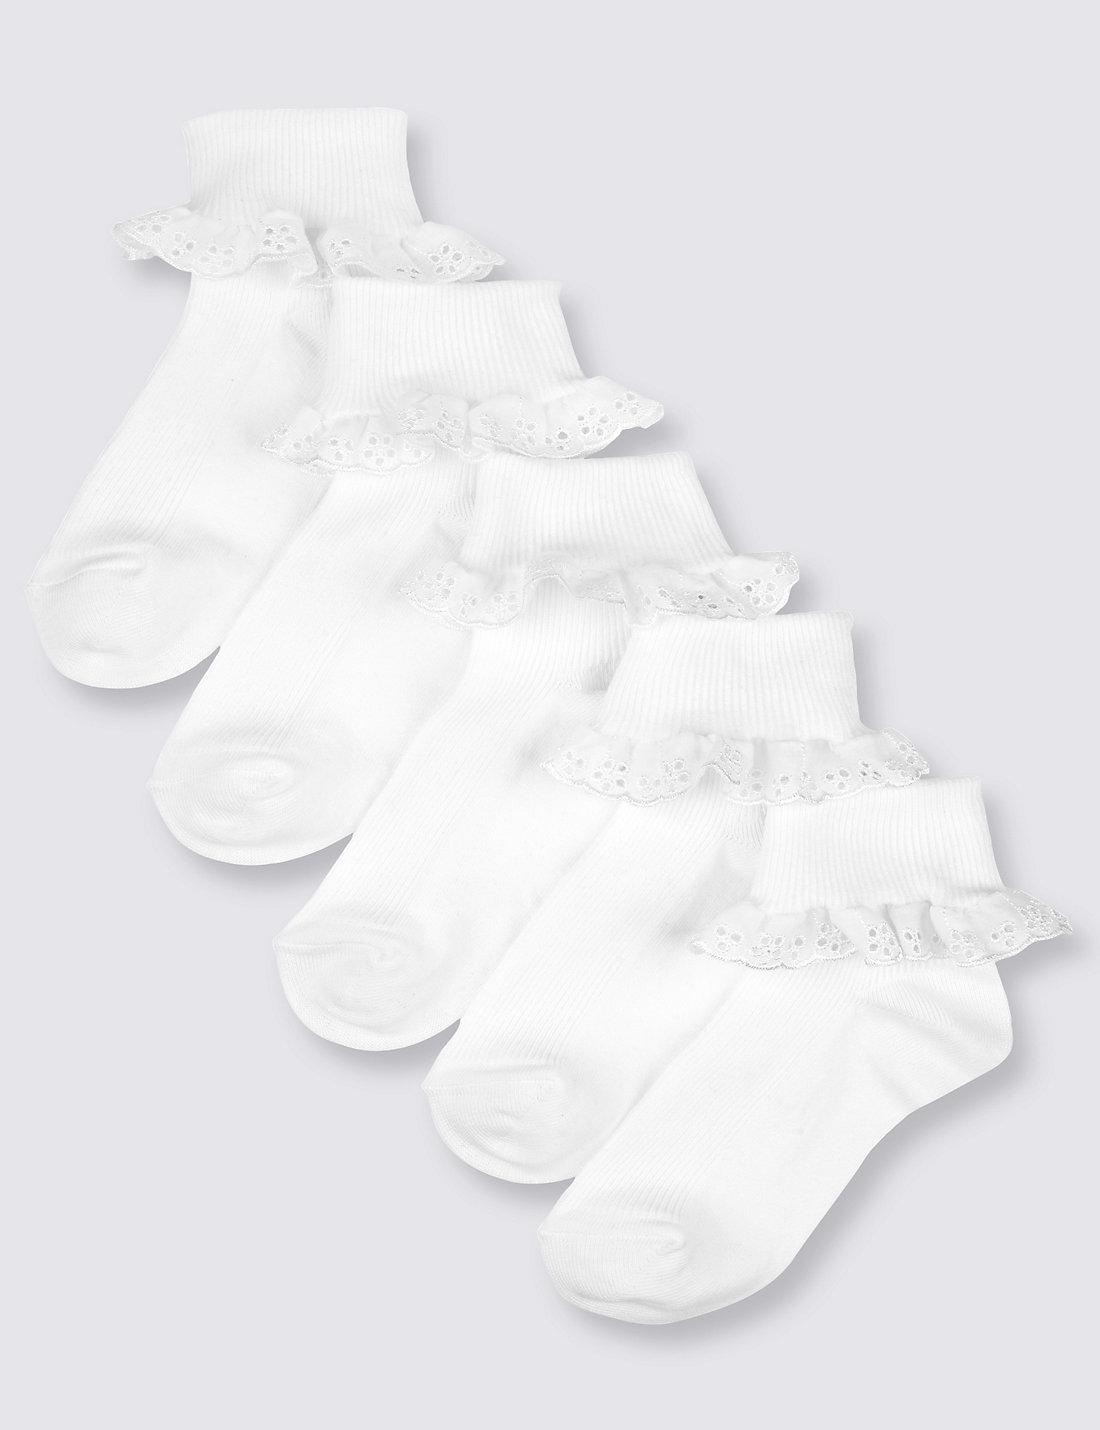 Black gloves sulit - 5 Pairs Of Freshfeet Trade Cotton Rich Socks 2 11